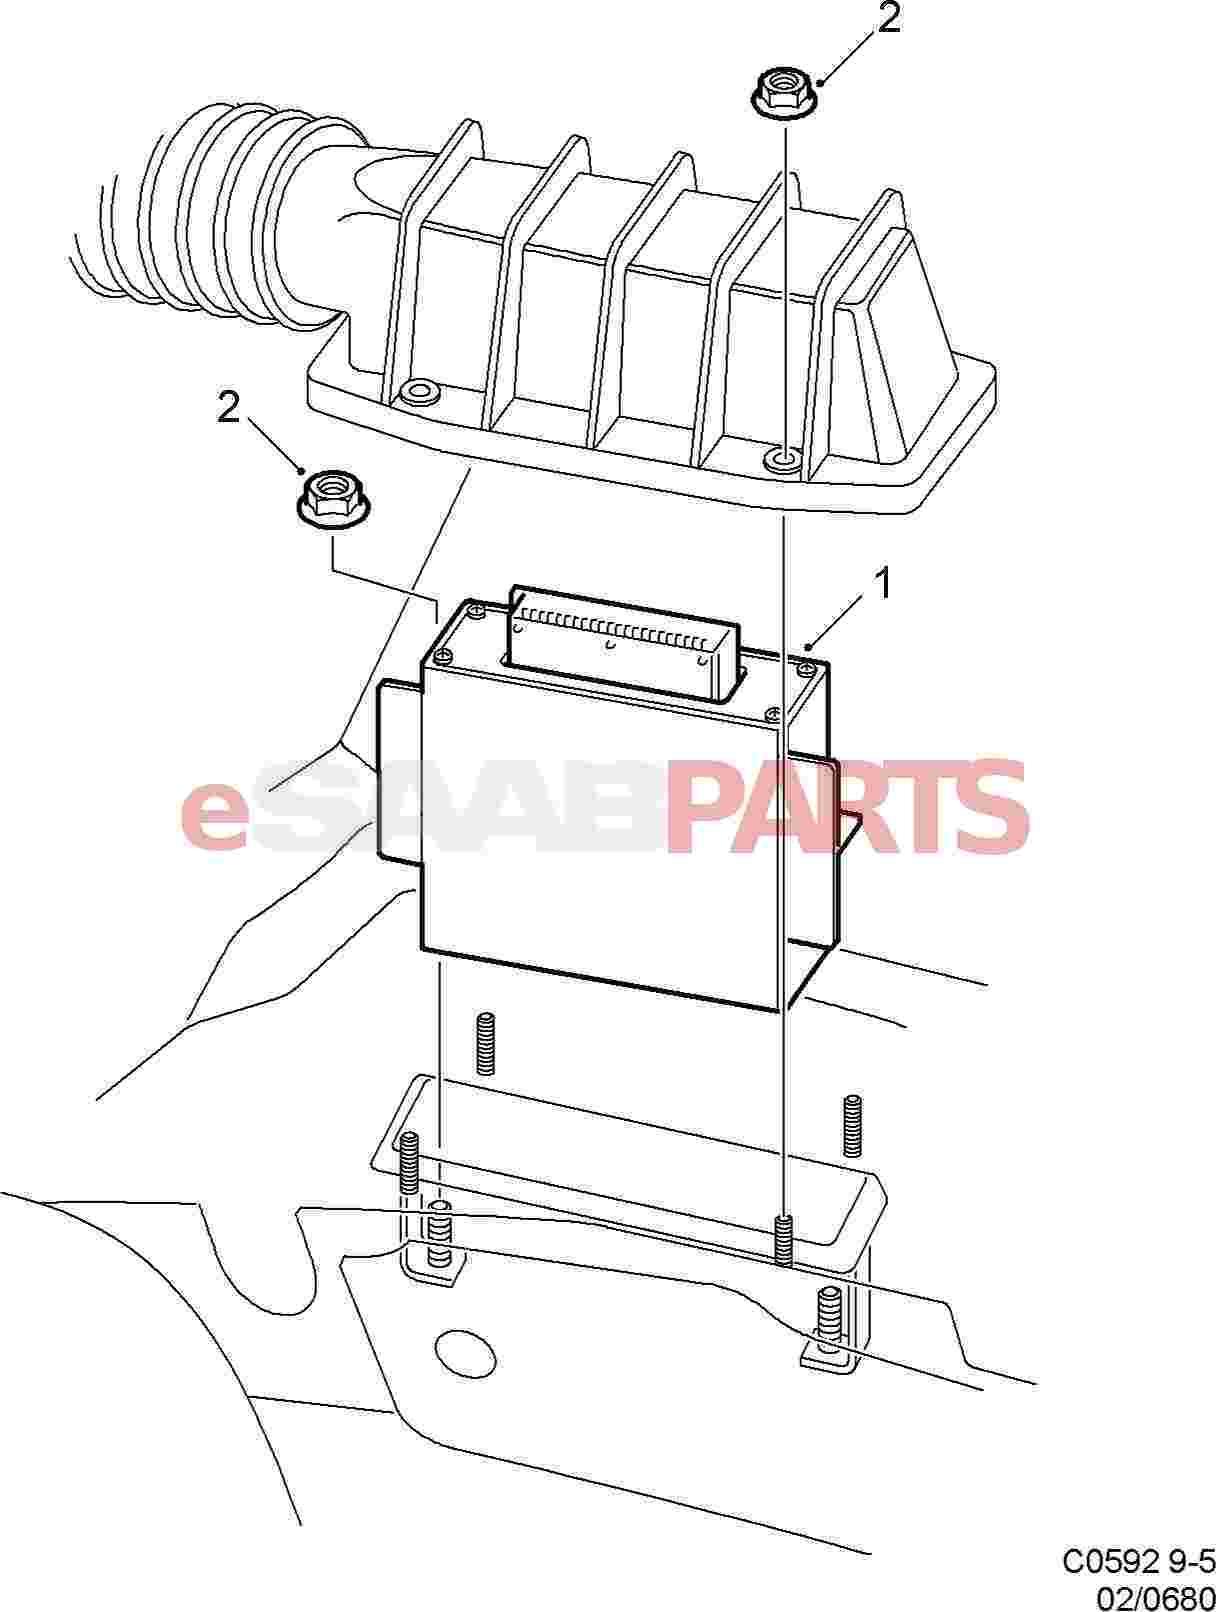 esaabparts saab 9 5 9600 electrical parts engine control Saab 9 5 Repair Manual esaabparts saab 9 5 9600 electrical parts engine control module trionic ecm 2001 2009